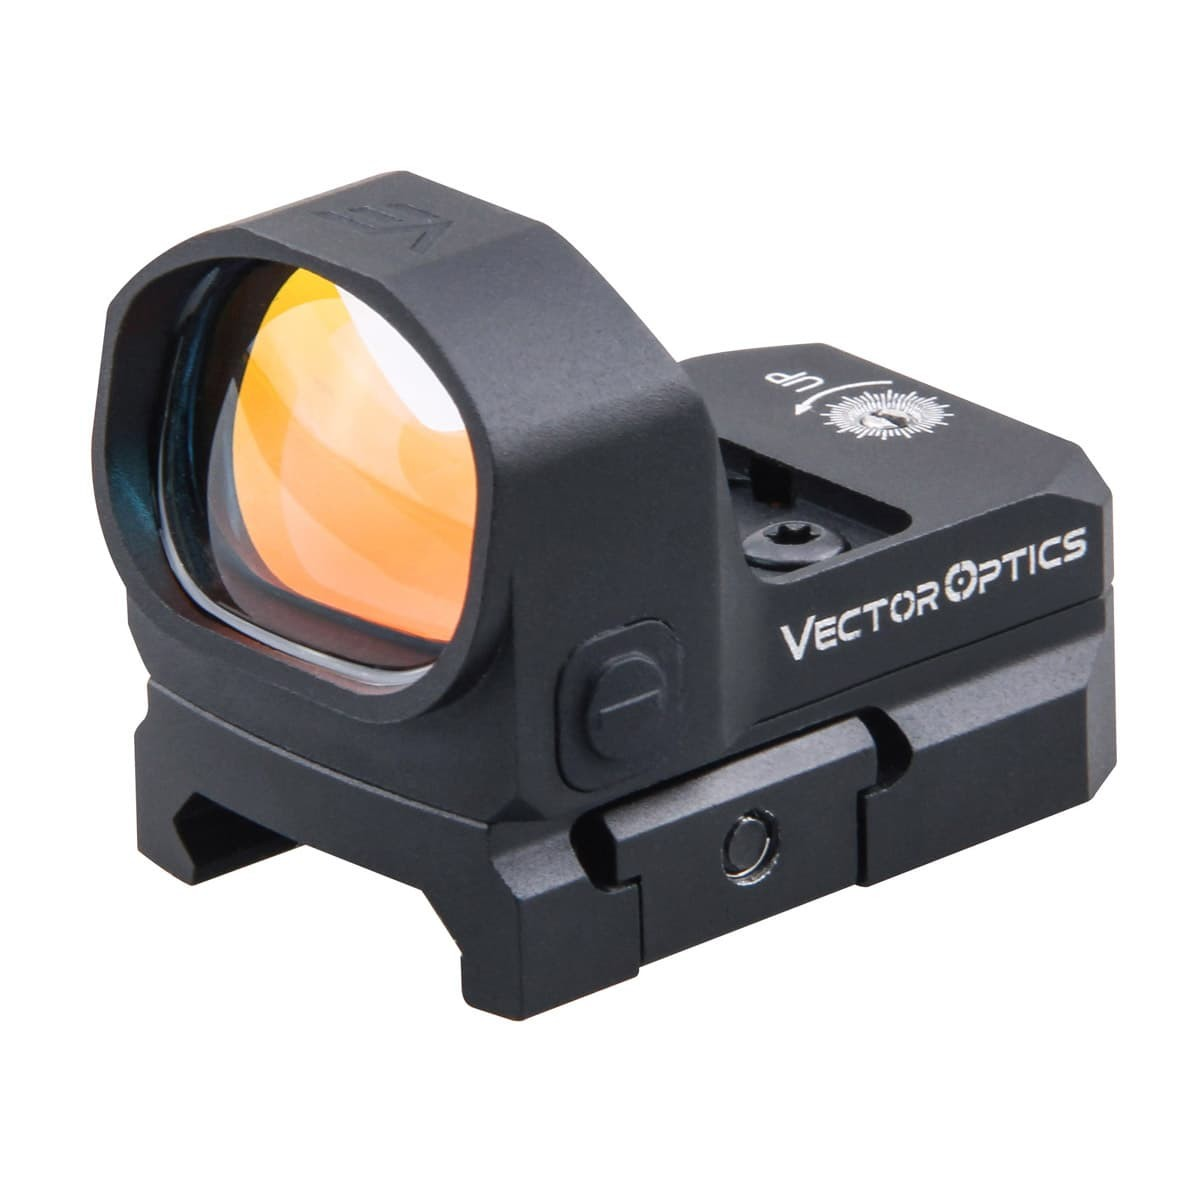 Vector optics Frenzy 1x20x28